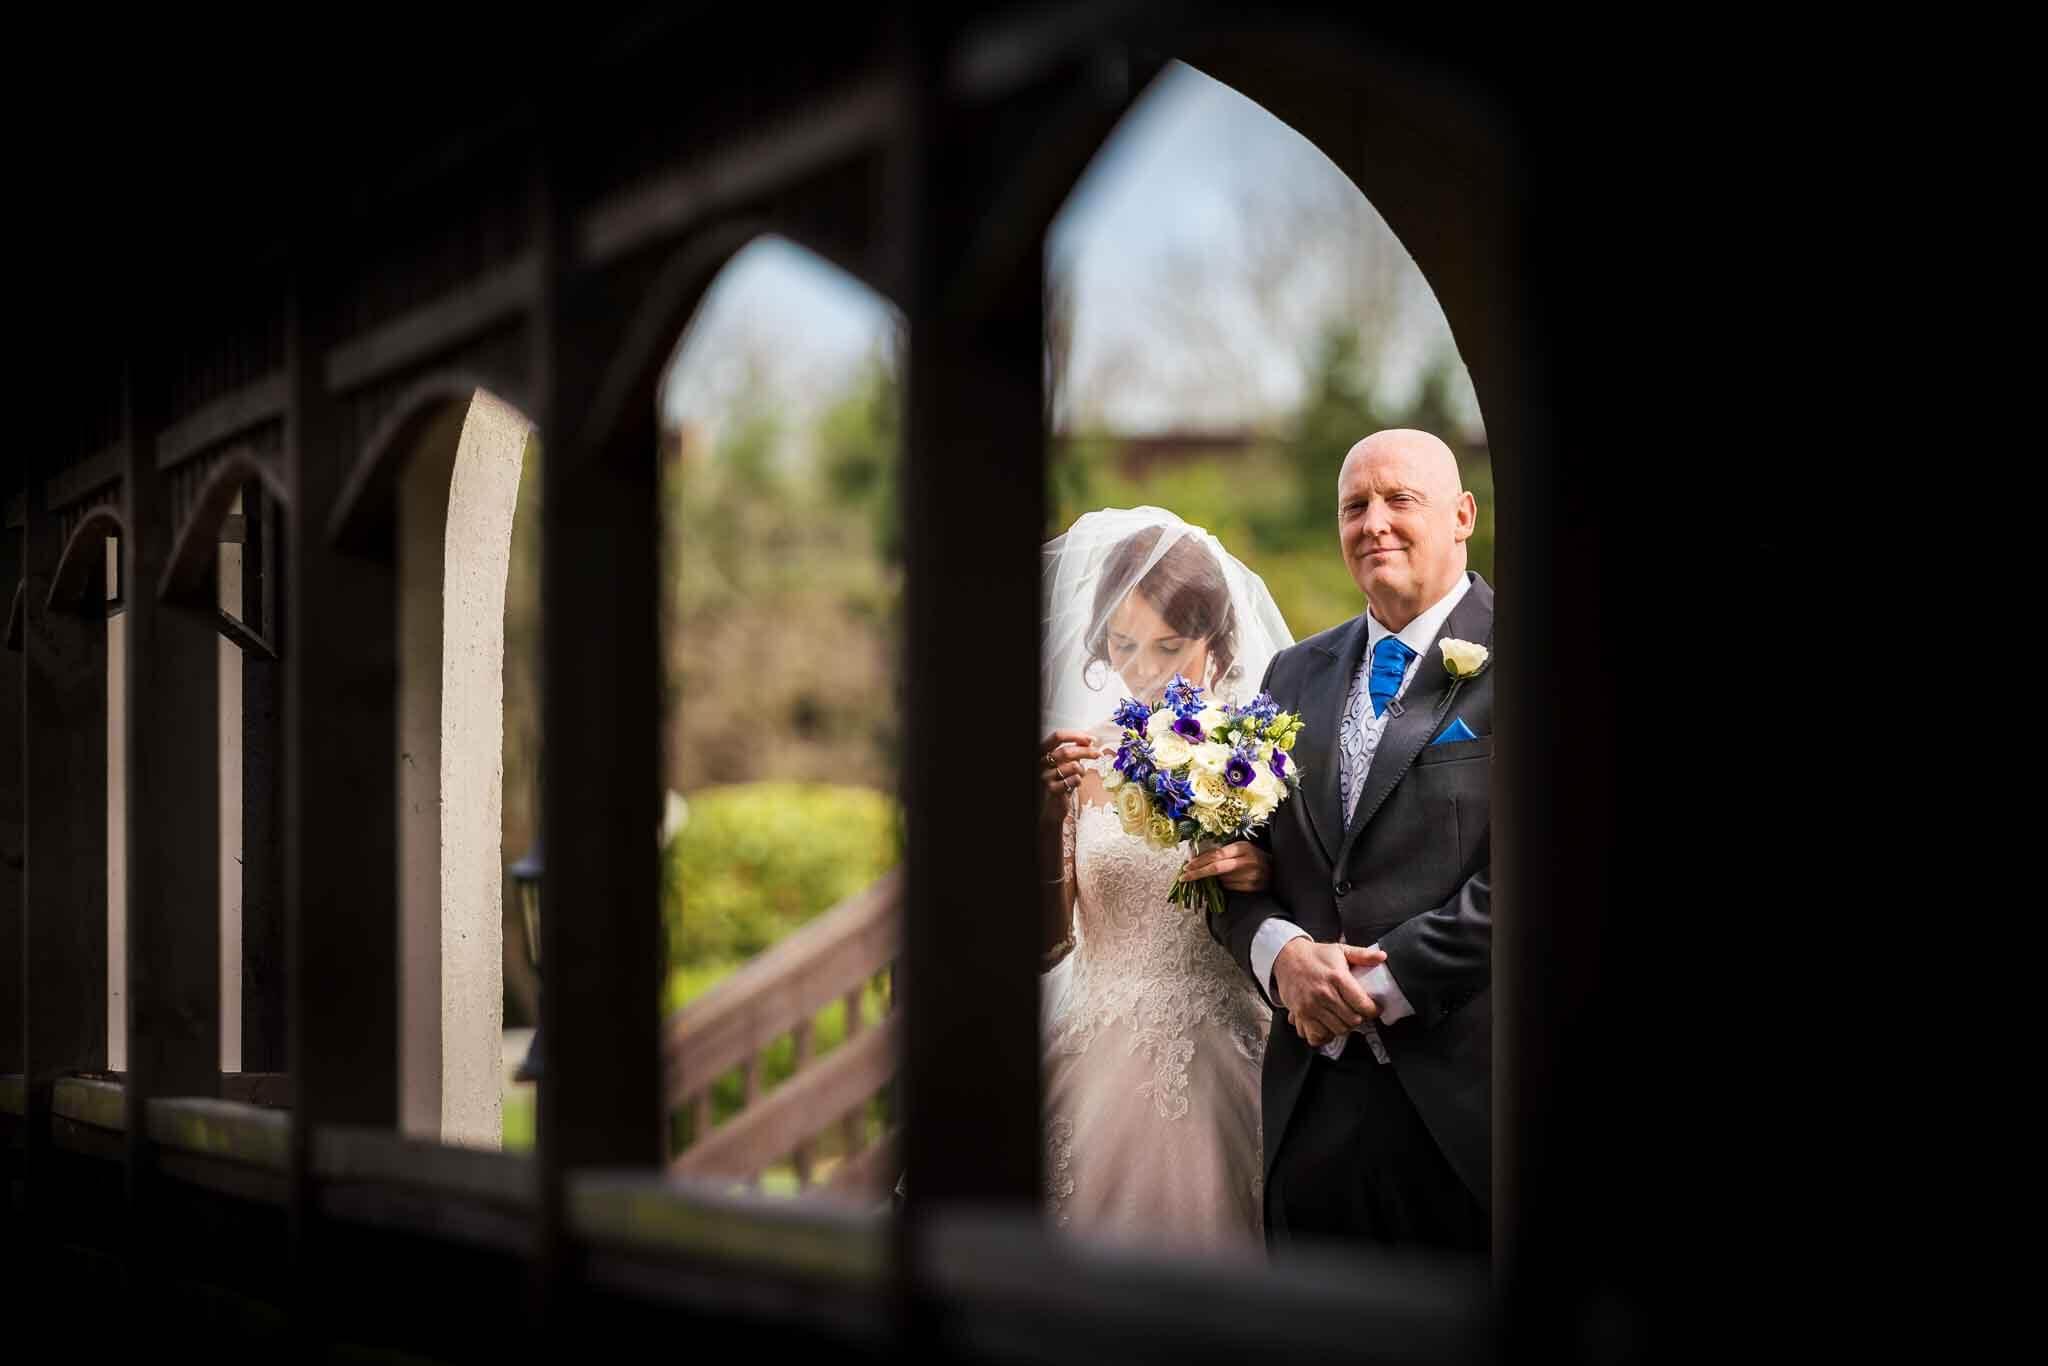 nick-church-bristol-wedding-photographer-0070.jpg